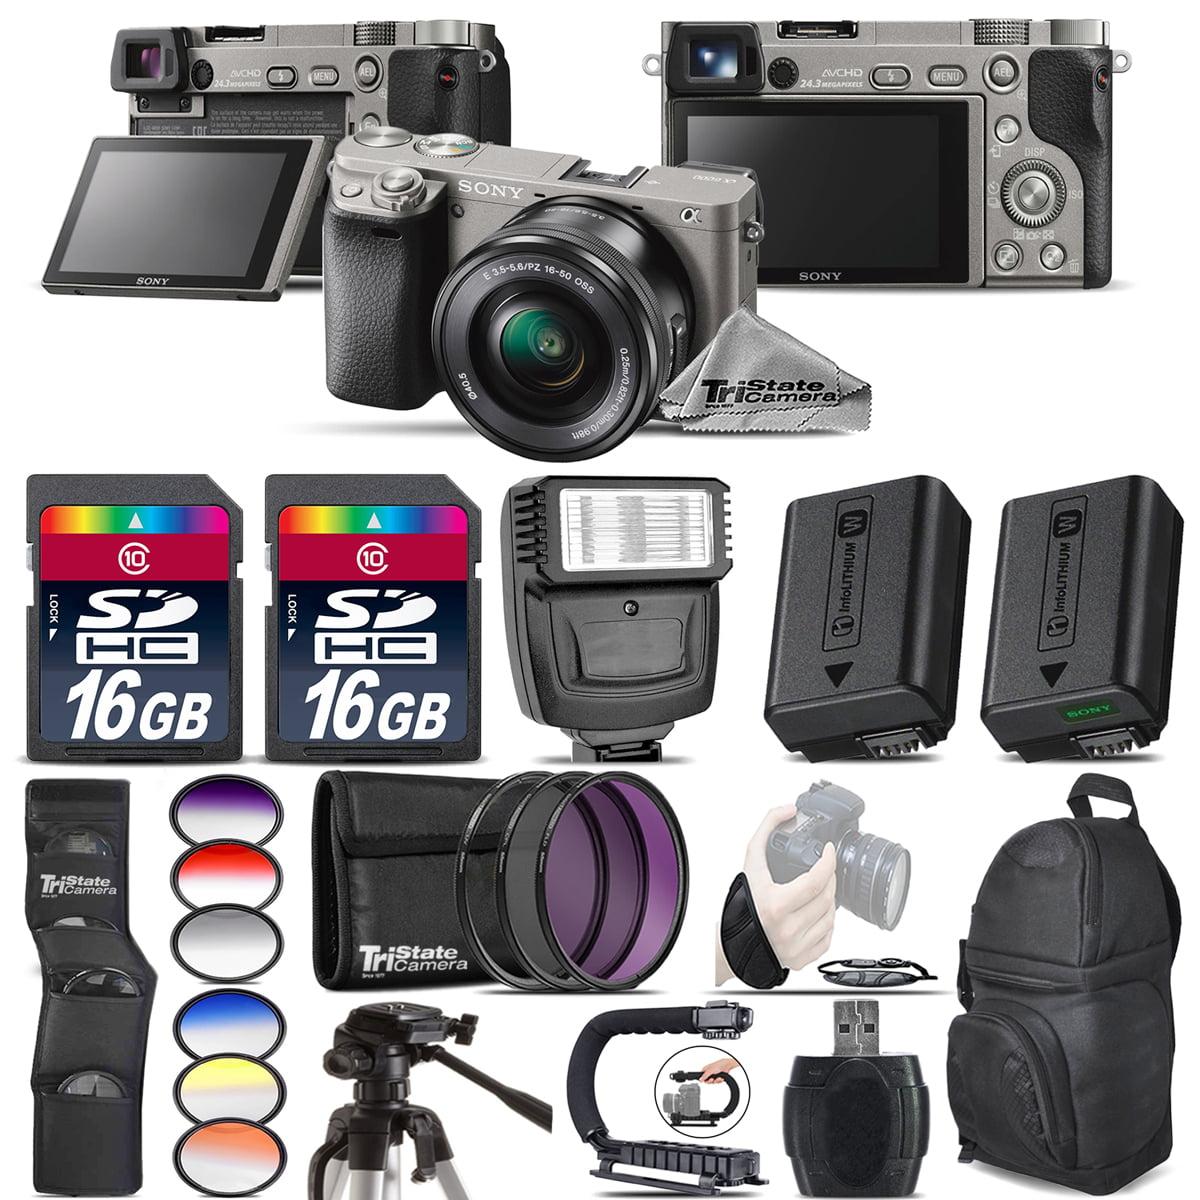 Sony Alpha a6000 Mirrorless Camera + Flash + Extra Battery + UV-CPL-FLD + 32GB